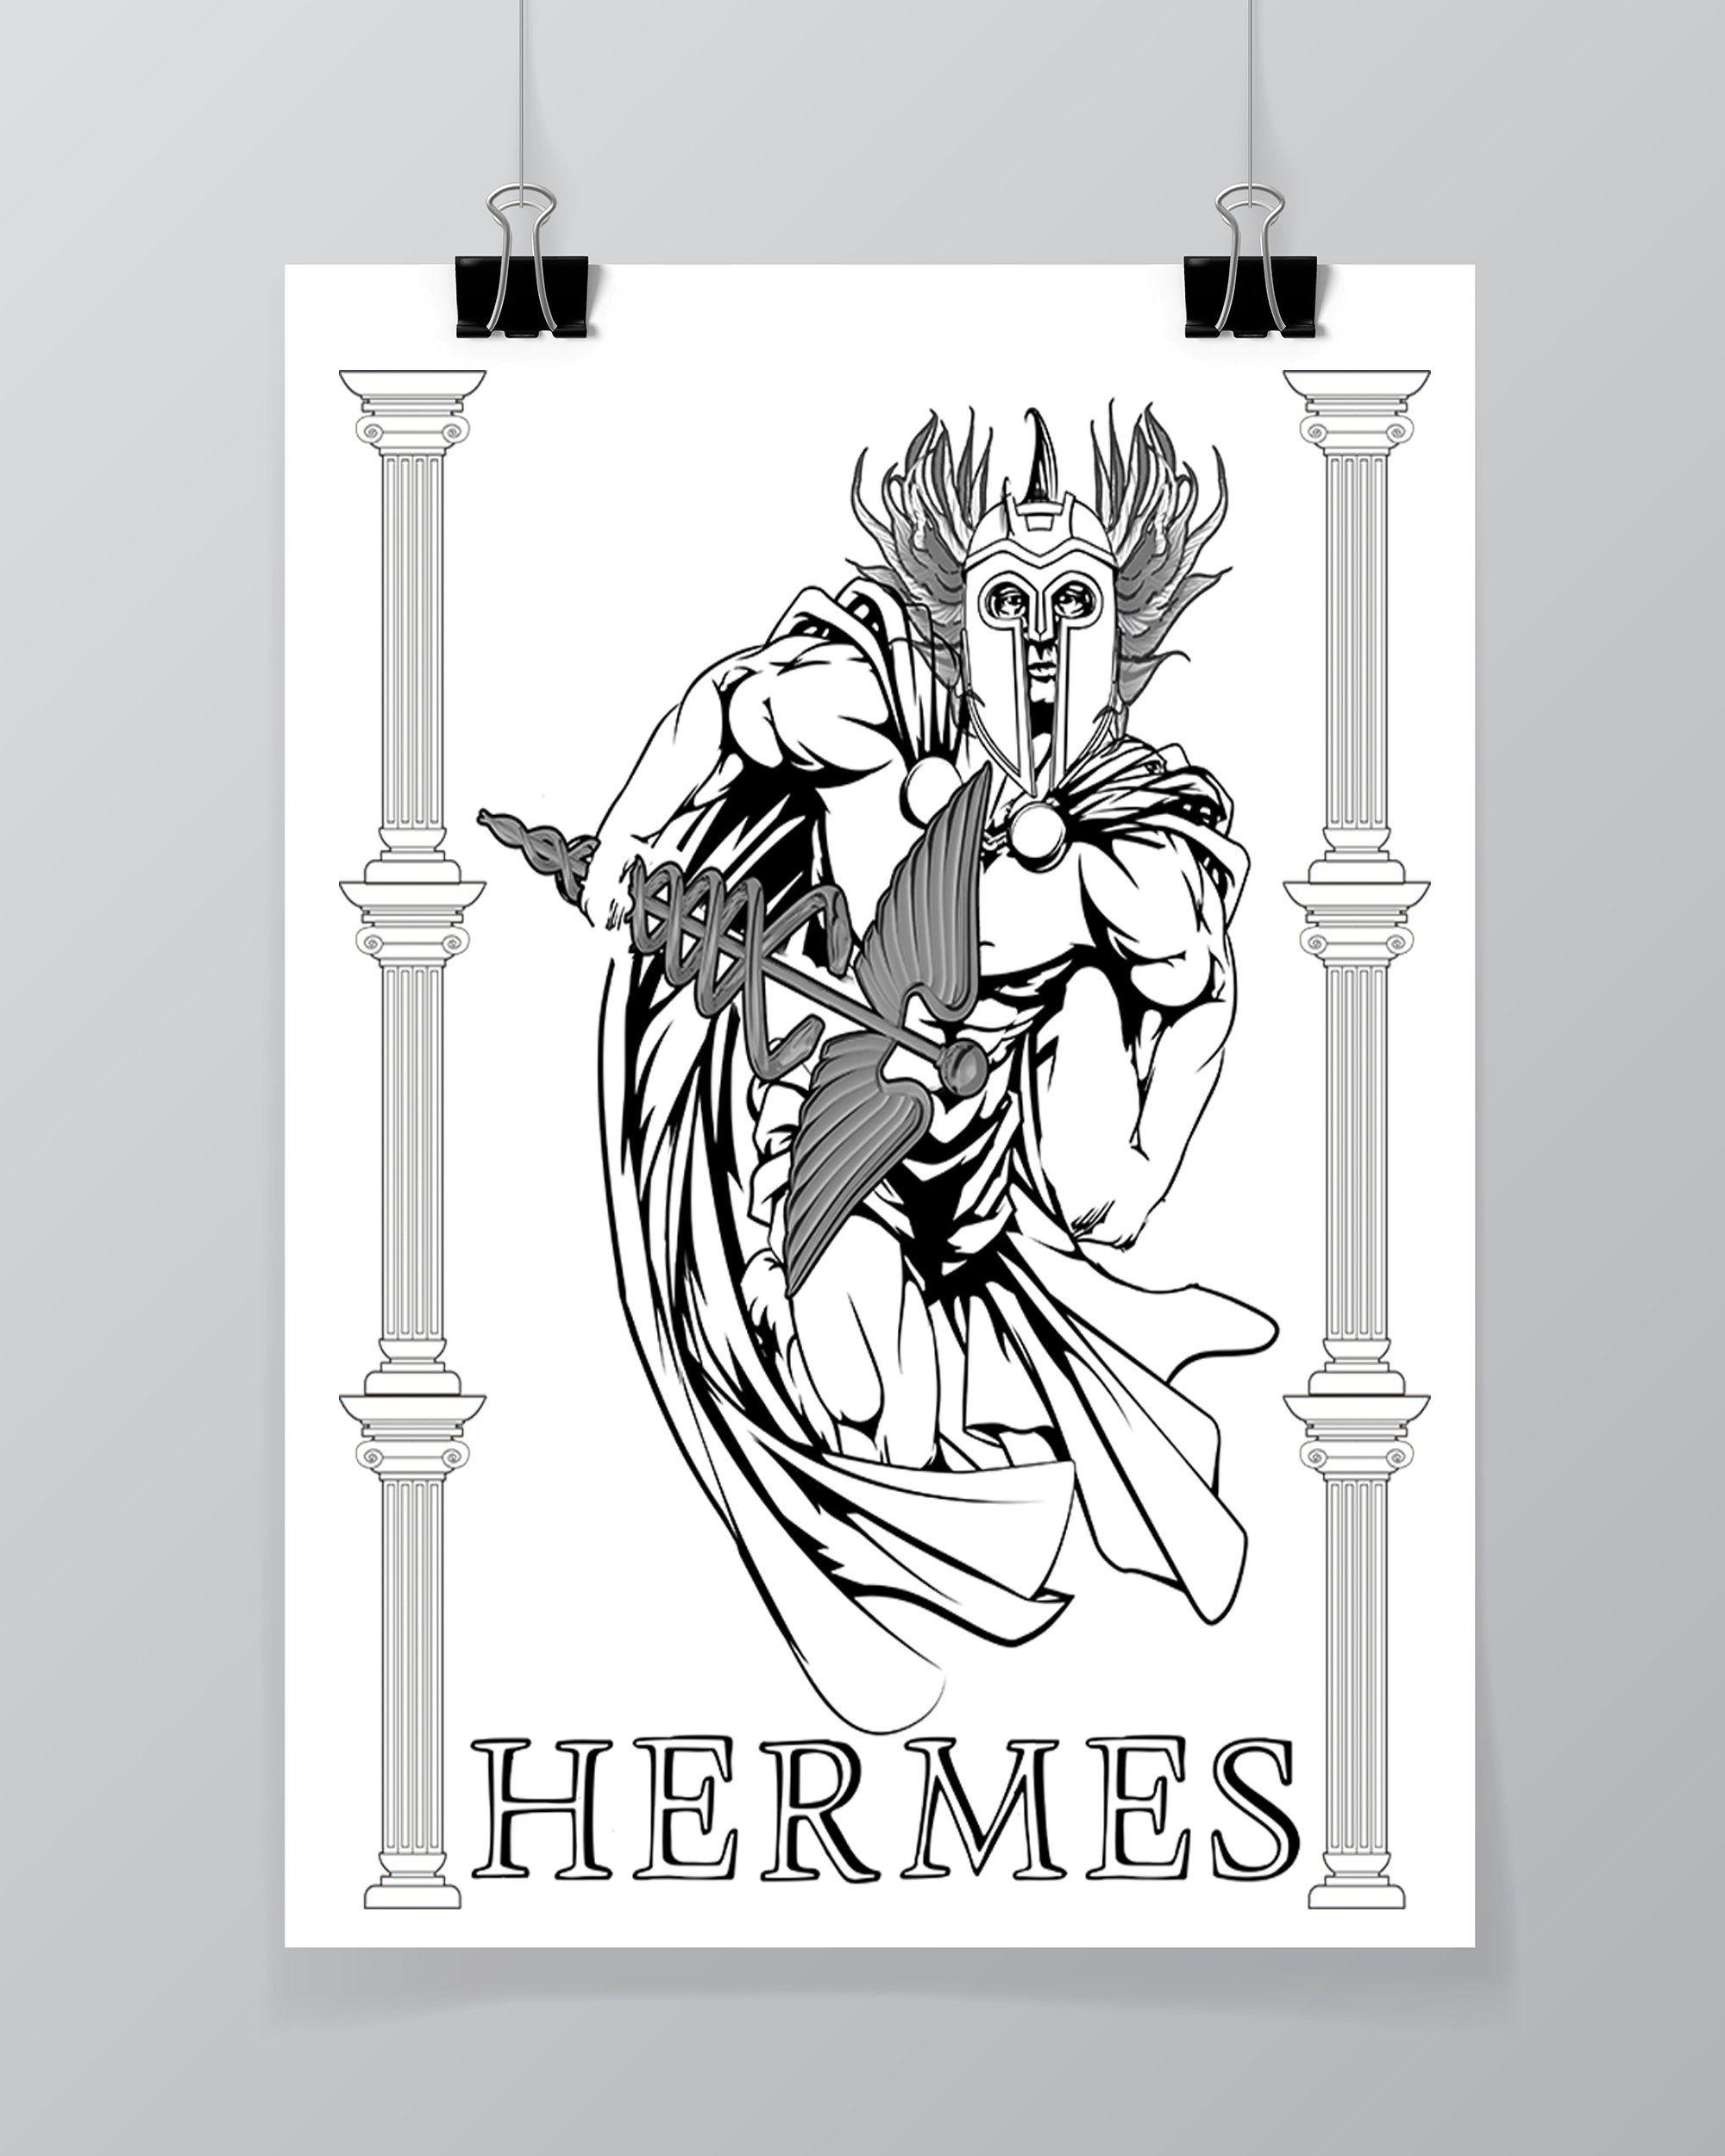 Hermes Greek God Greek Mythology Printable Wall Art Room Etsy Greek Mythology Gods Greek Gods Printable Wall Art